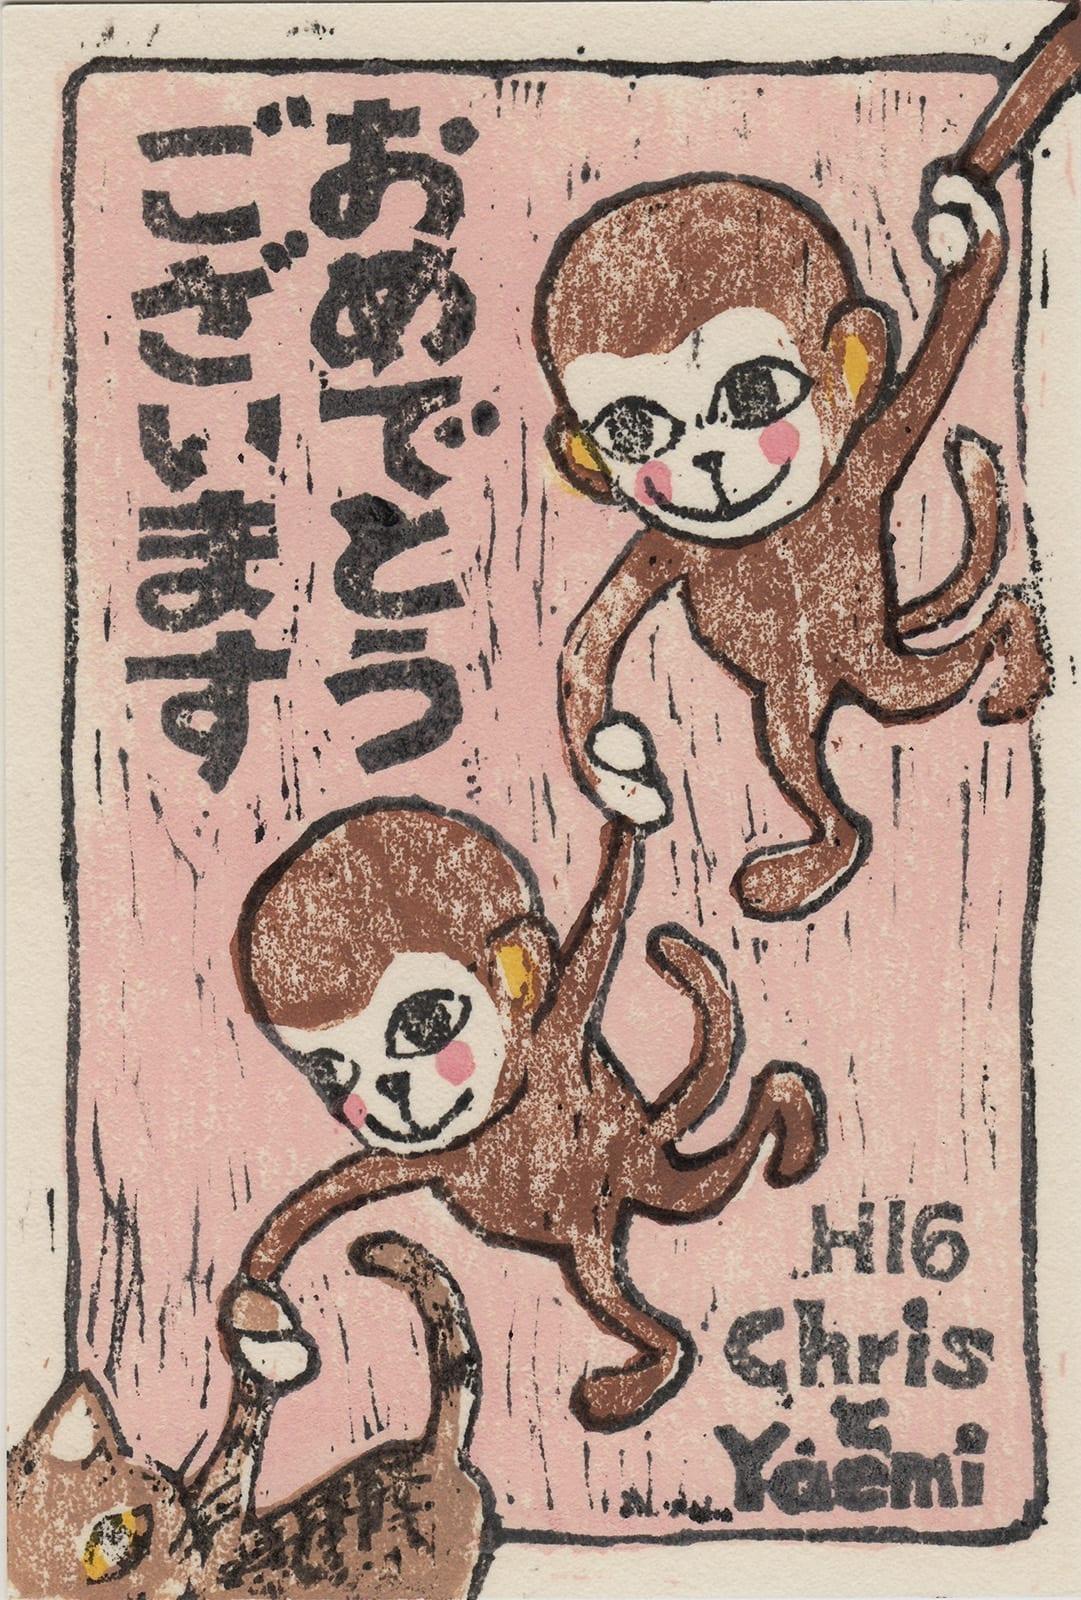 2004 (Heisei 16) New Year's Card: Year of the Monkey